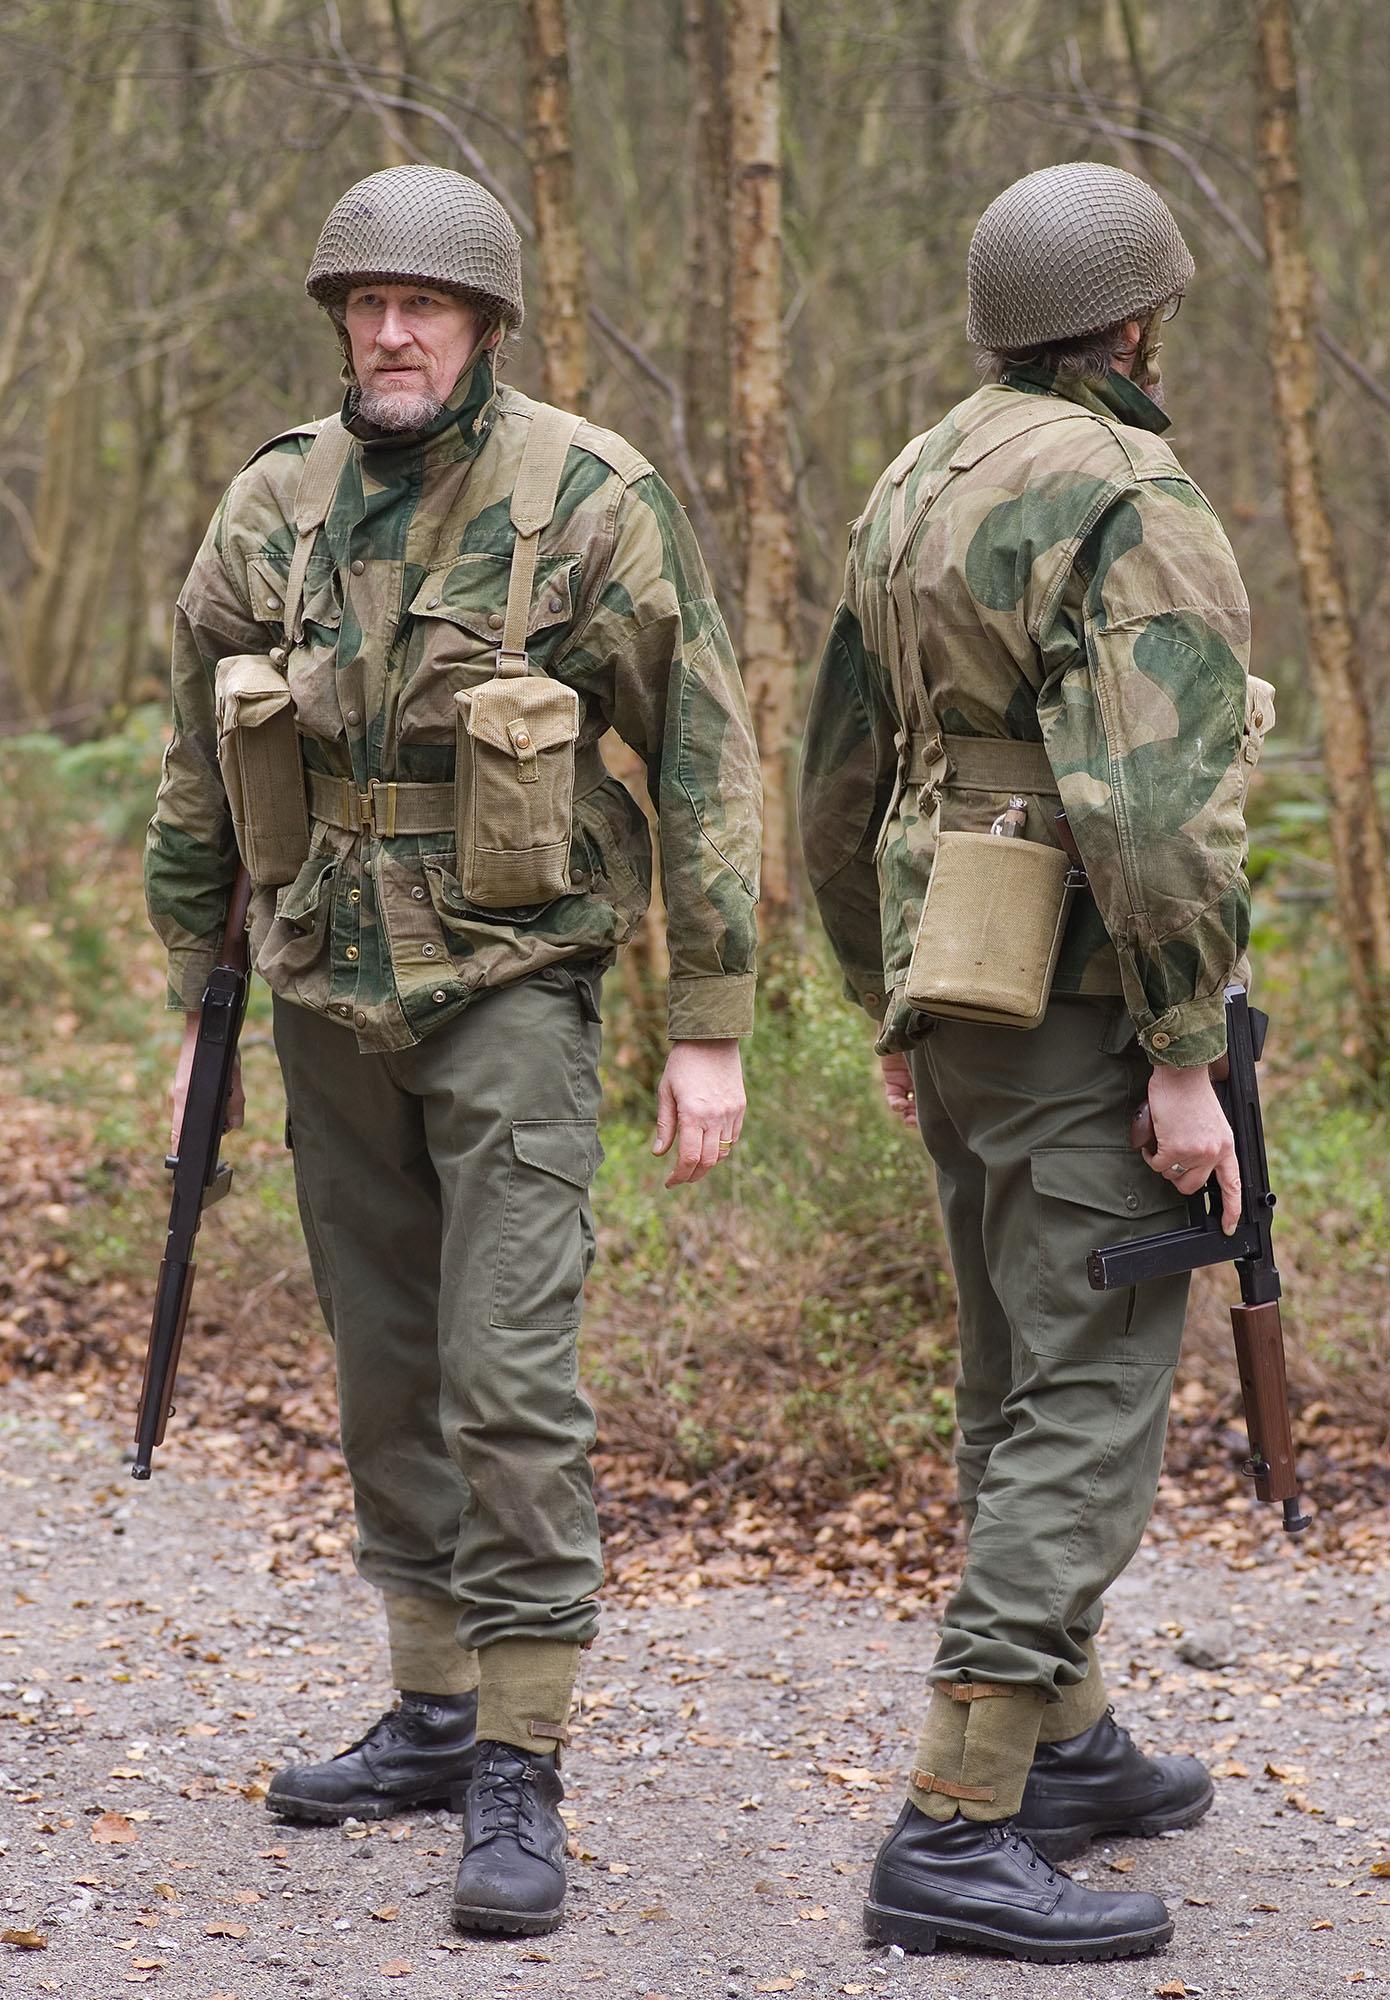 British Airborne basic impression